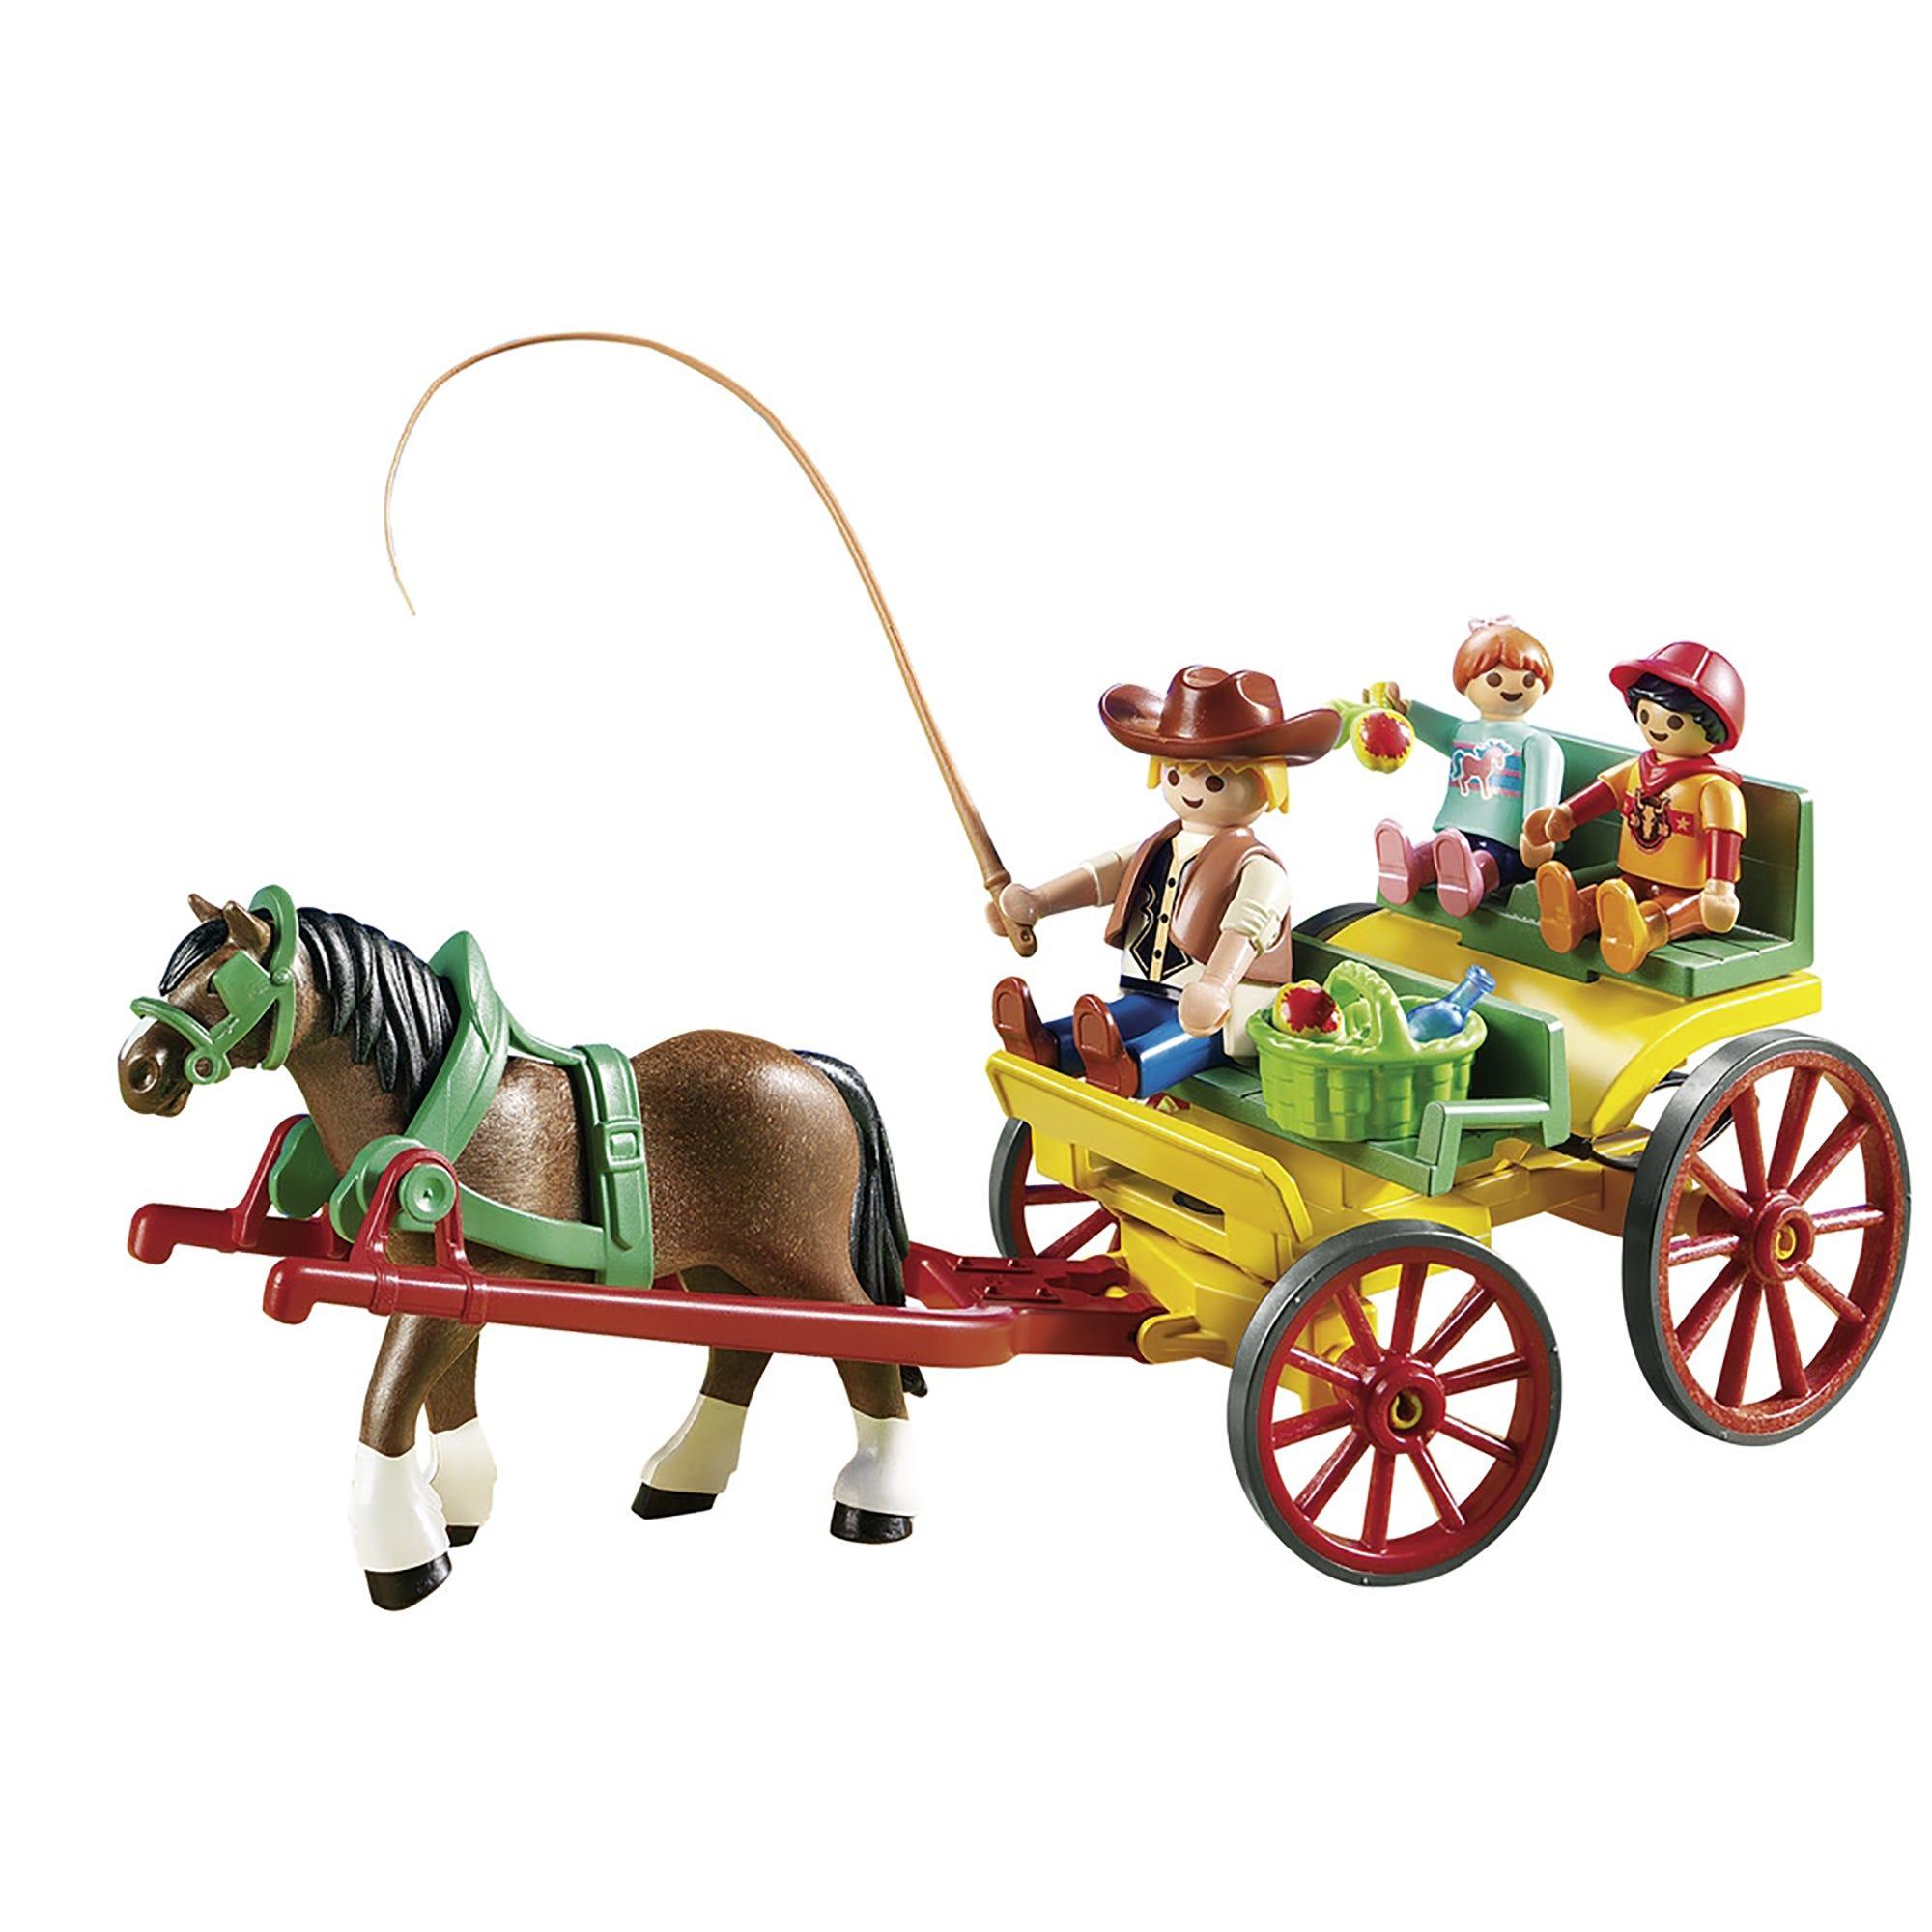 Playmobil Country Horse Drawn Wagon 6932